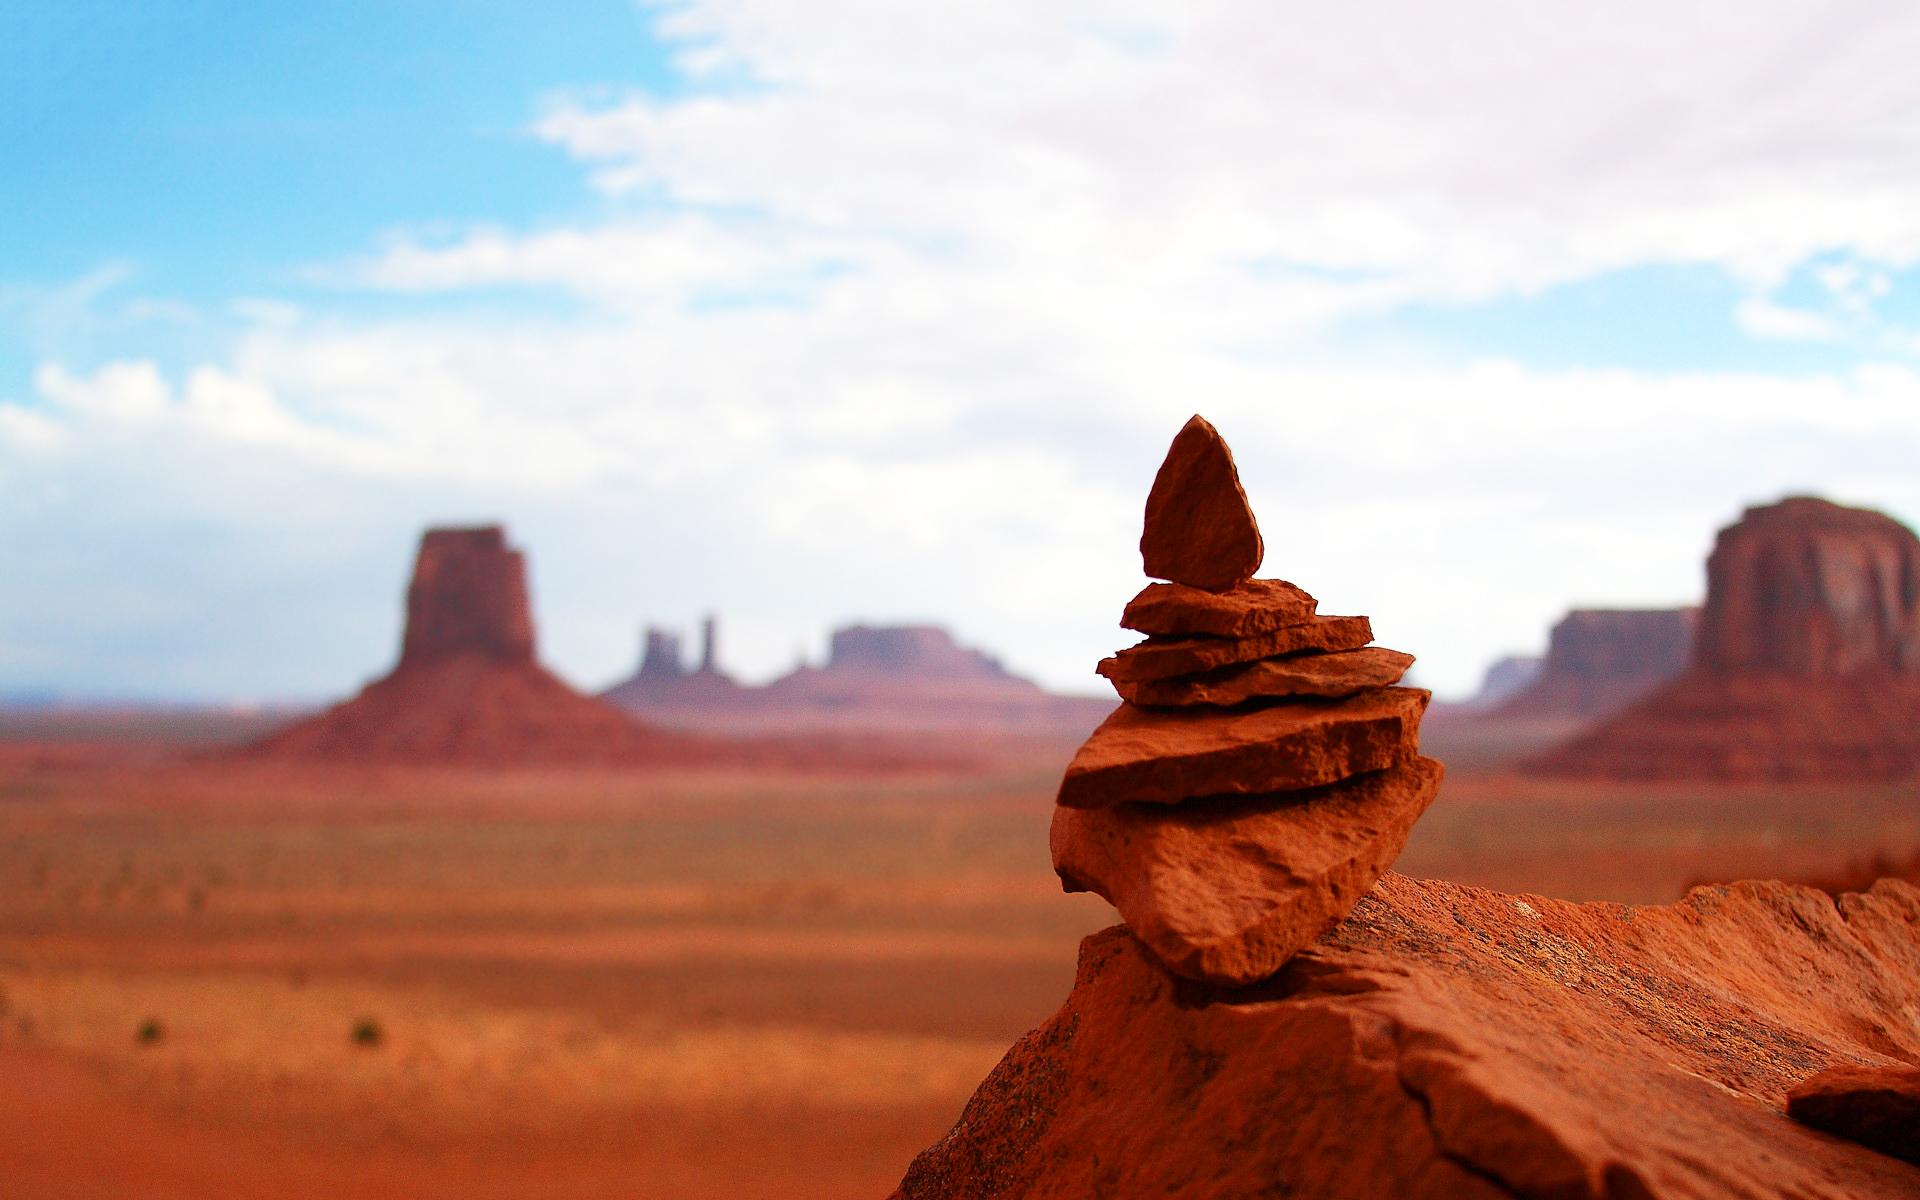 Canyon desert stones